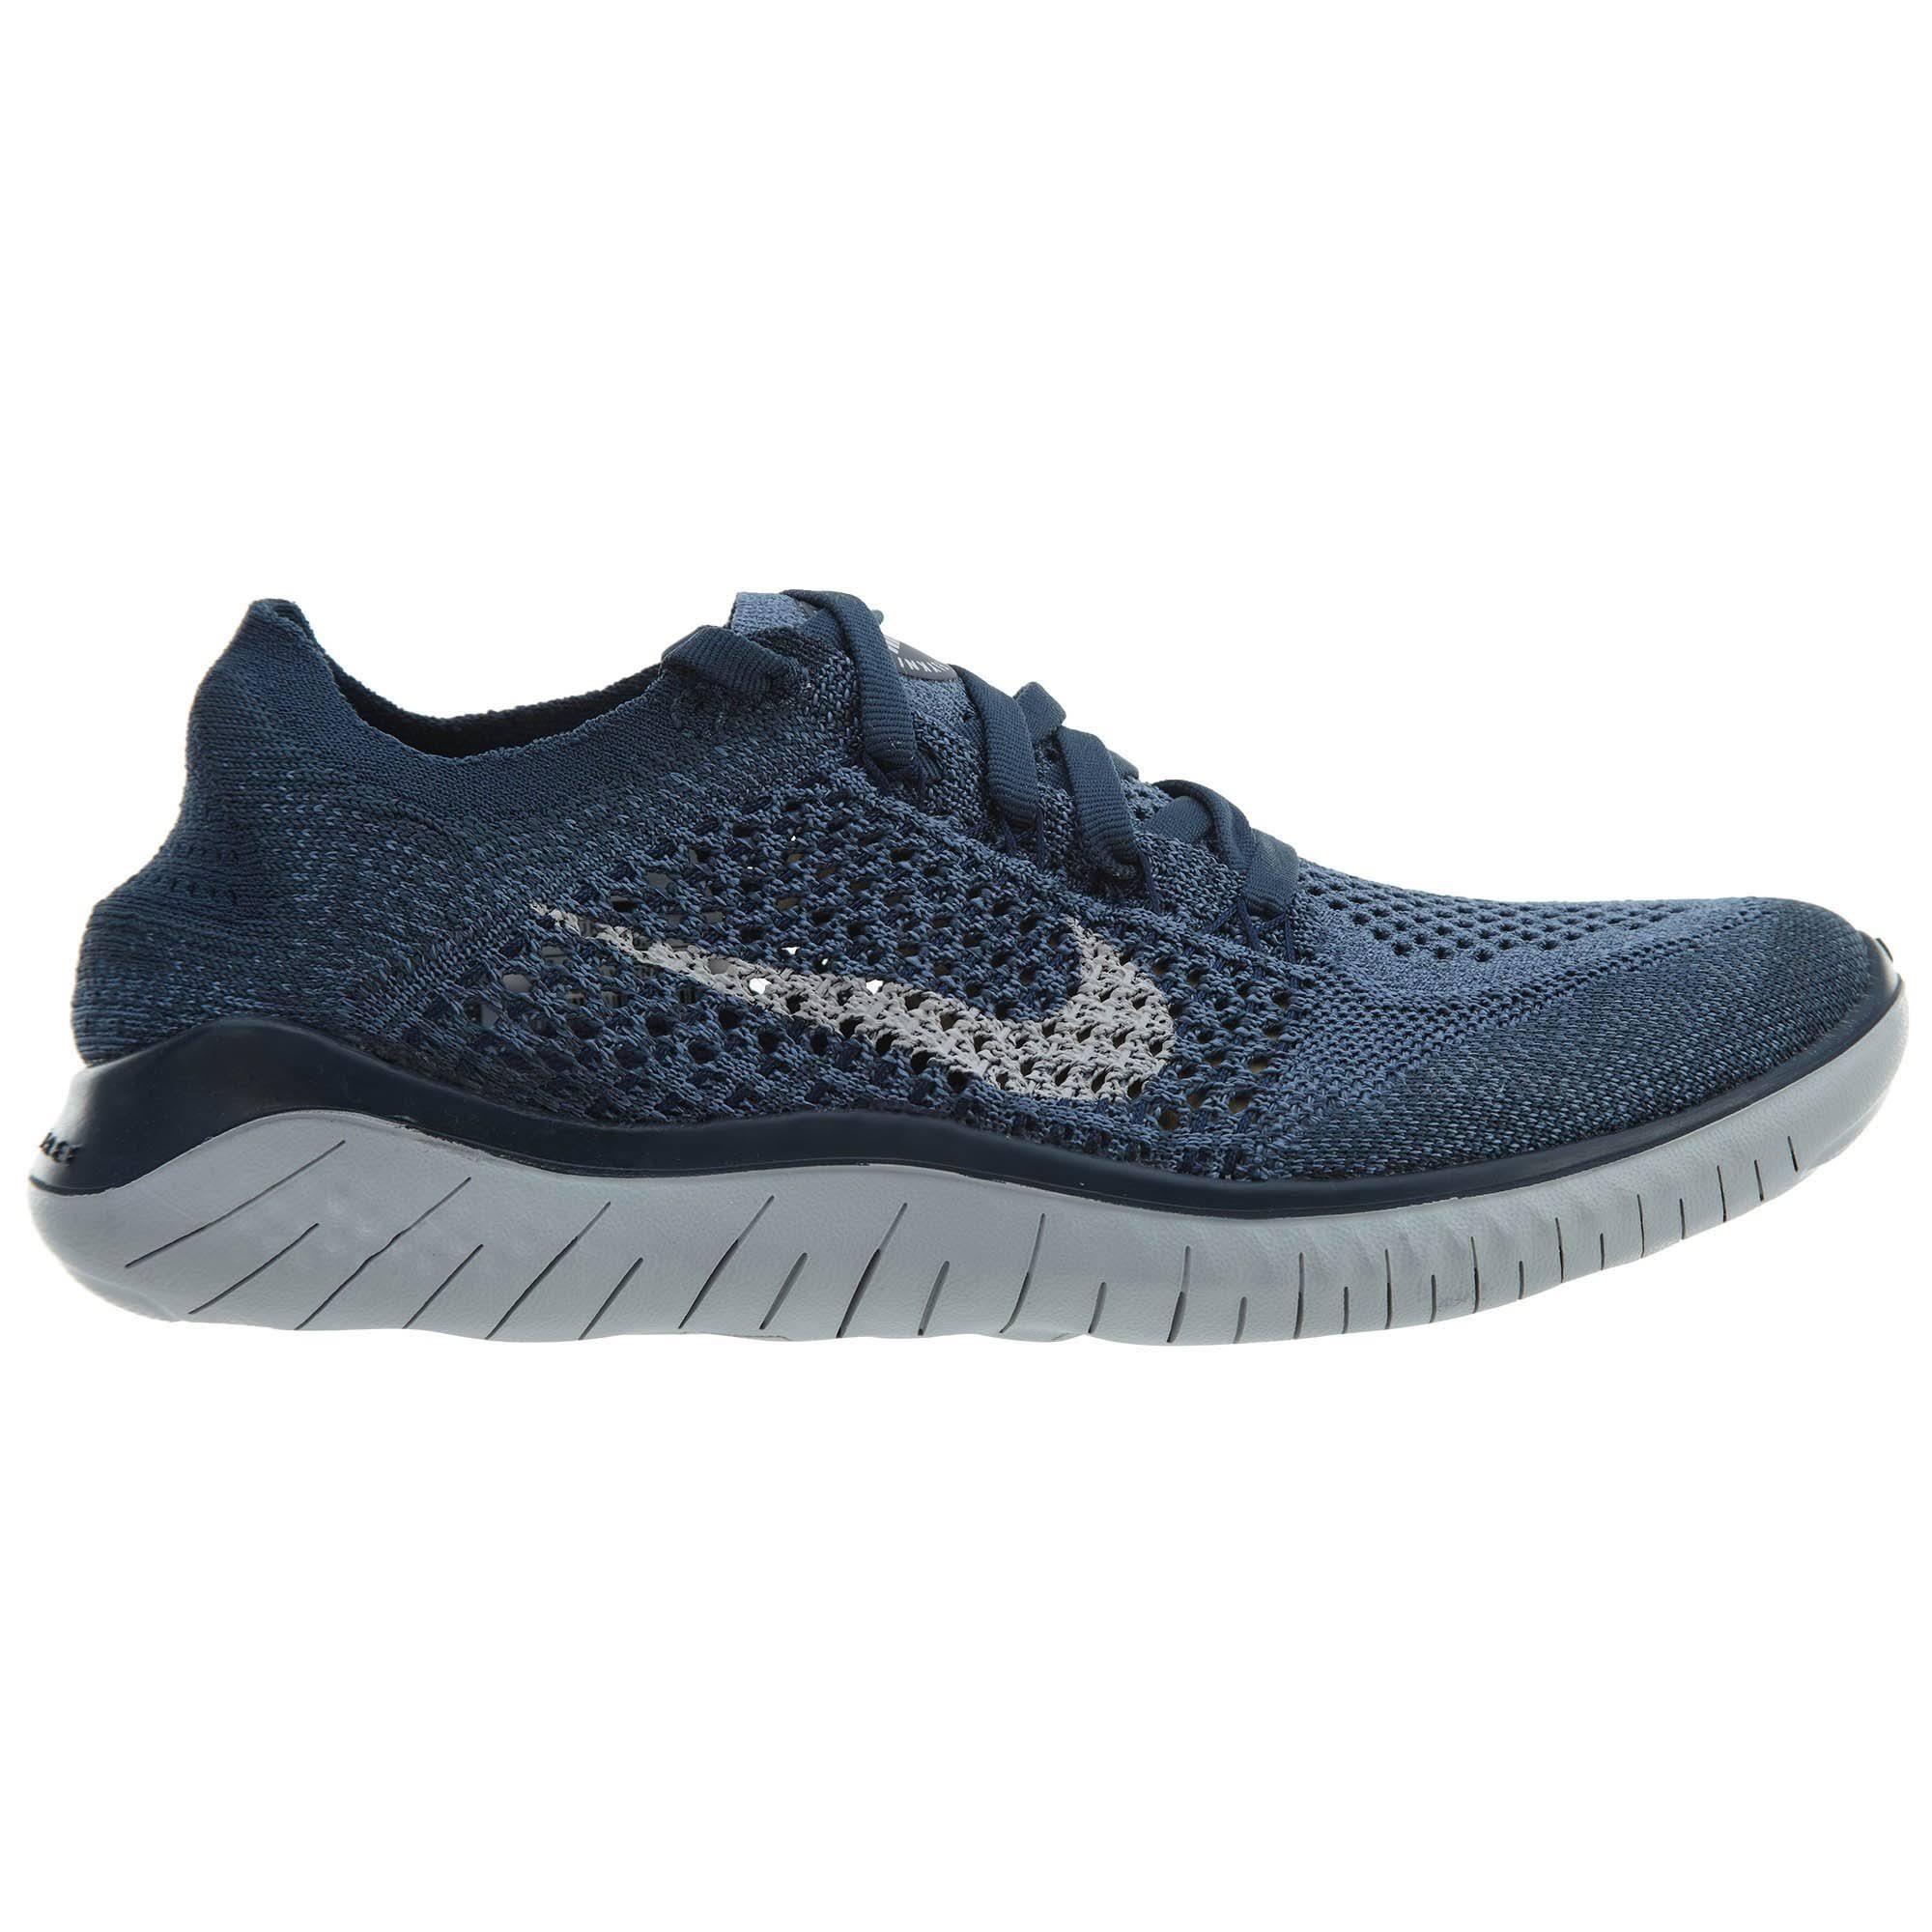 Zapatillas Nike Mujer De Pure 2018 Para Blue Running Flyknit Squadron Free Platinum Rn 1Xq8IX